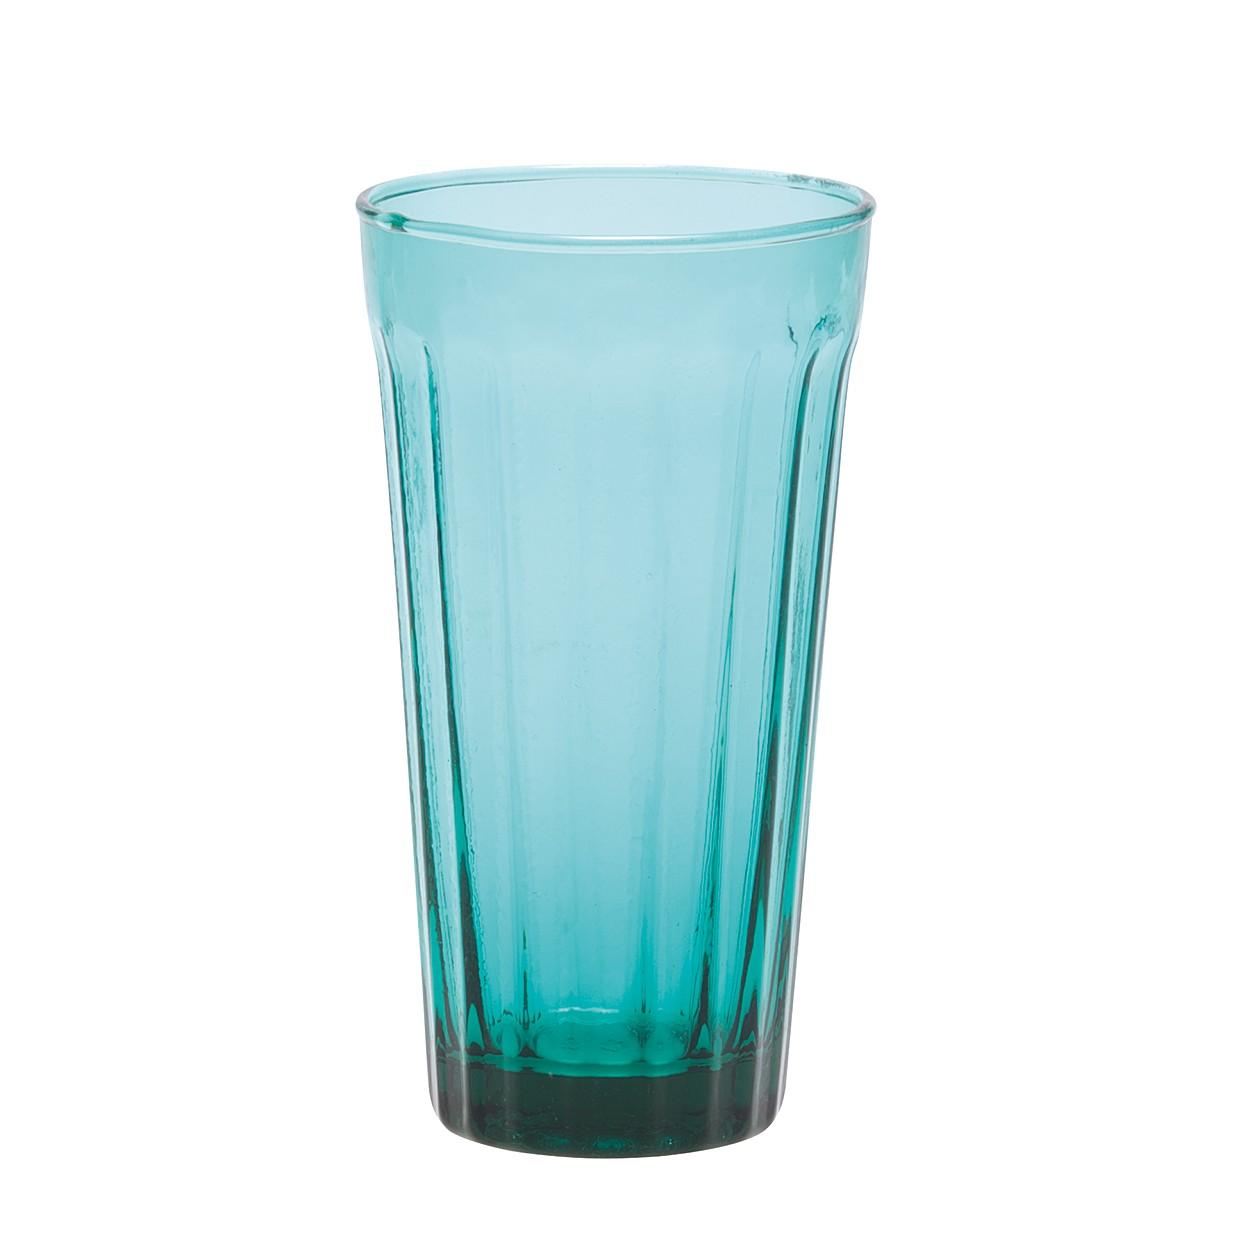 Longdrinkglas Lucca (6er-Set) – Glas – Pistaziengrün, BITOSSI HOME online kaufen